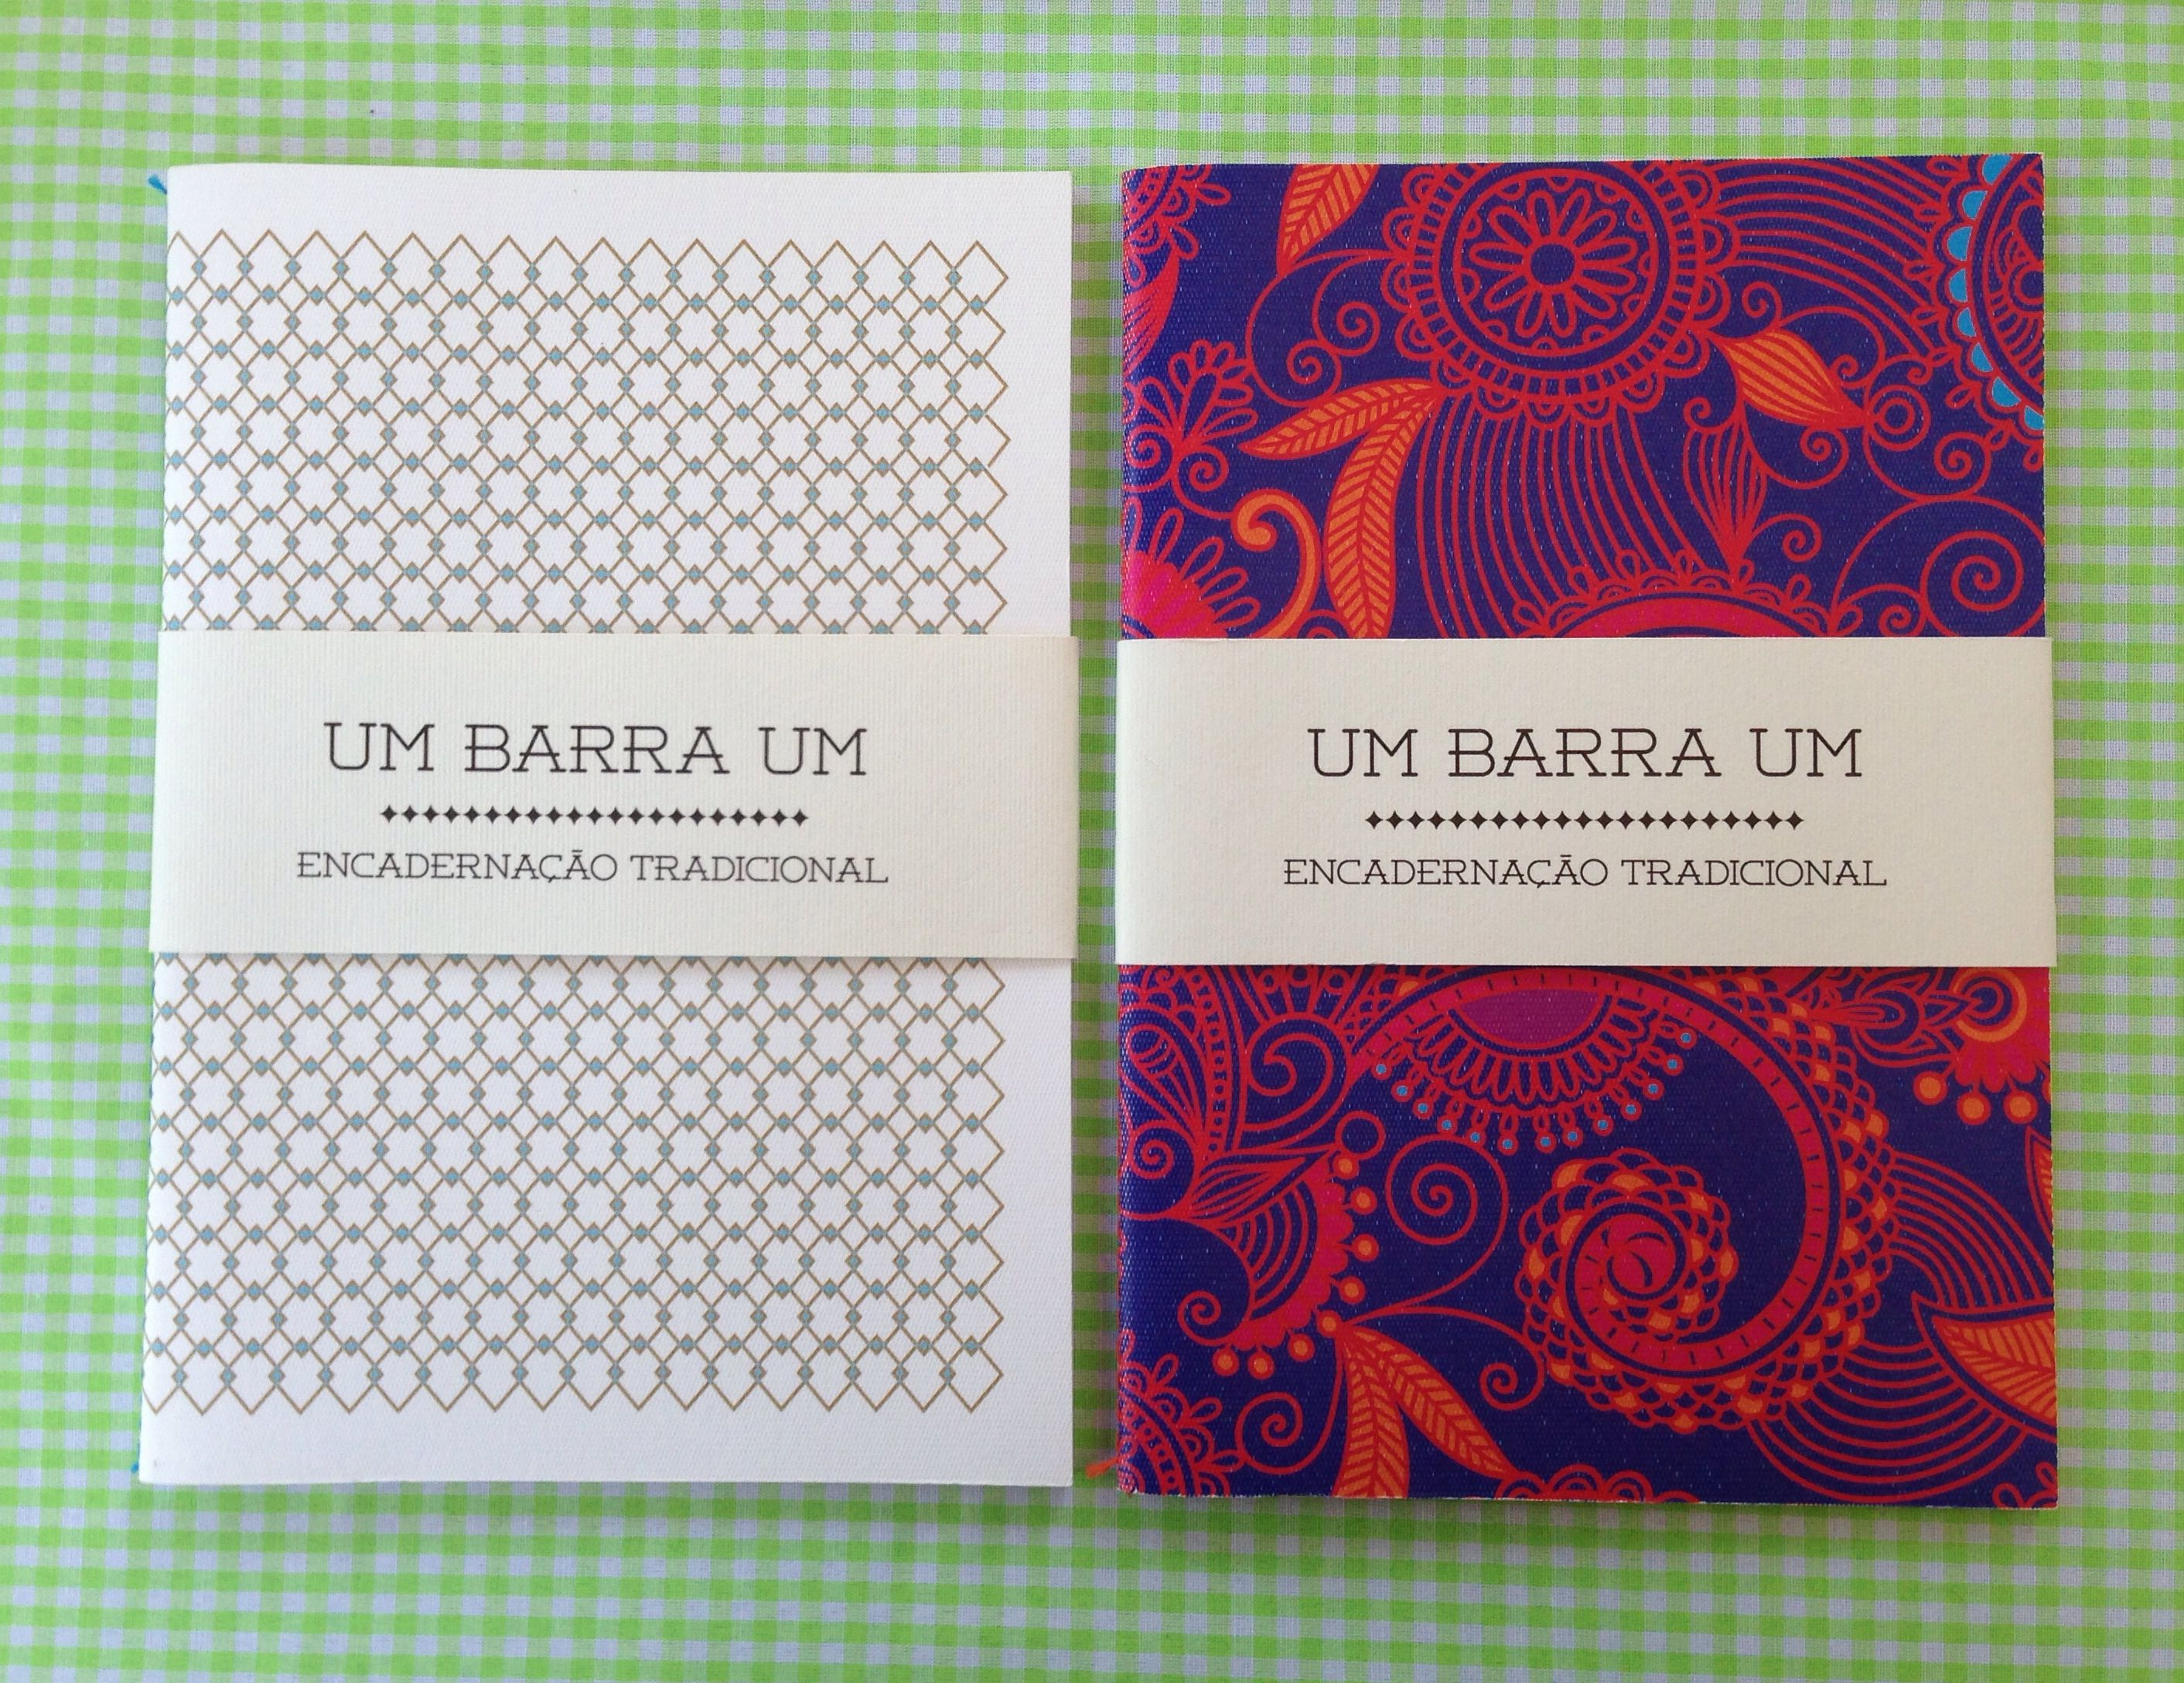 Notebooks 1/1 um barra um | Notebooks, scrapbooks and journals ...